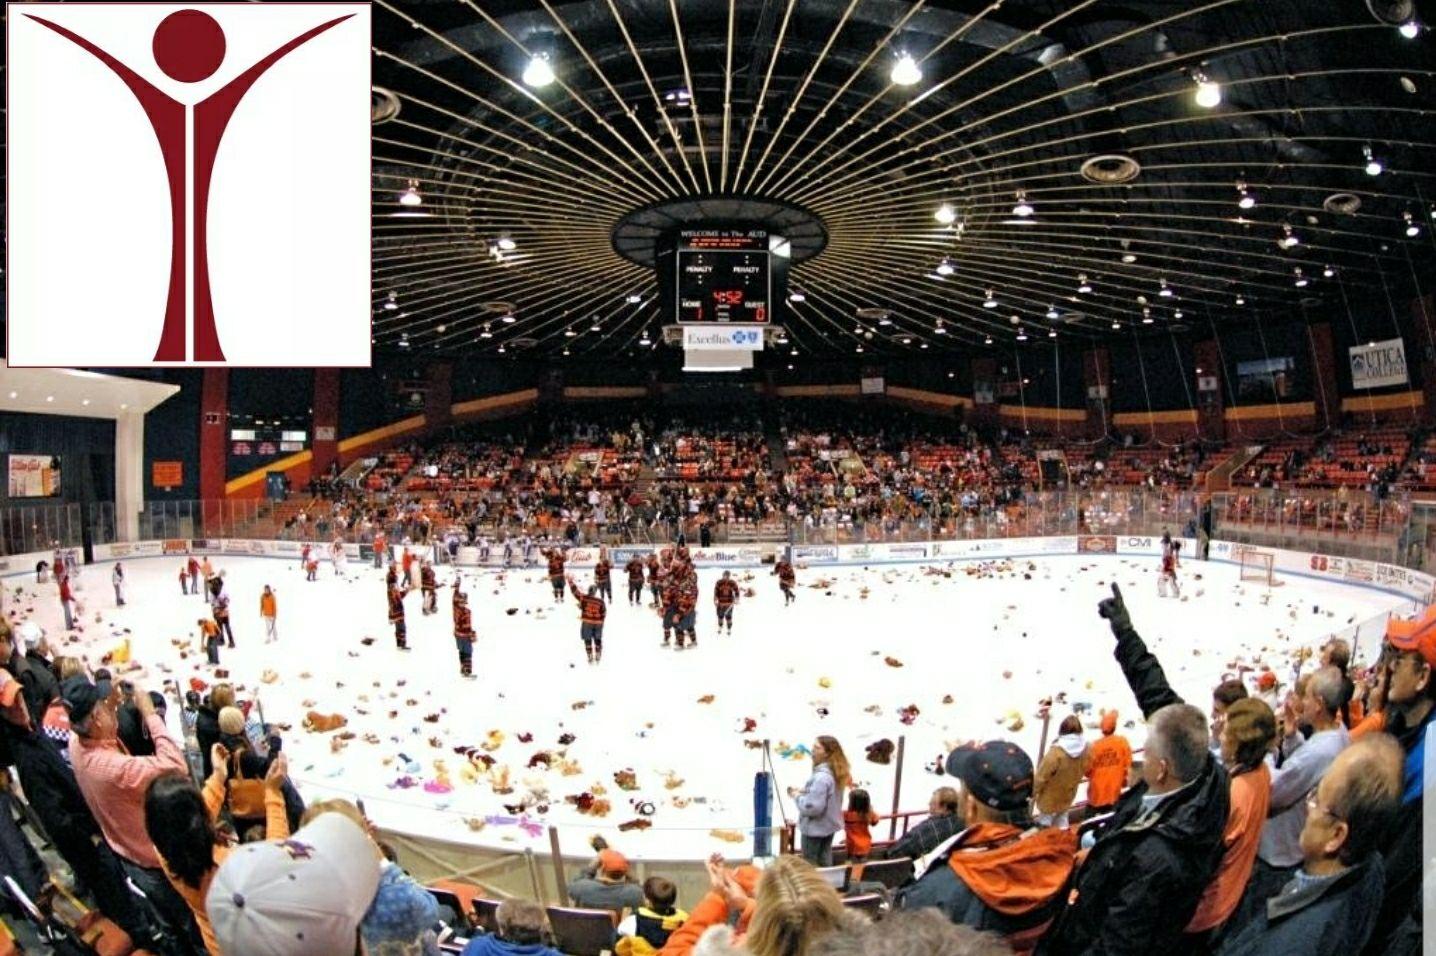 Utica College Hockey Night Pioneers Vs Manhattanville Let S Go Pioneers Utica College Hockey Utica College